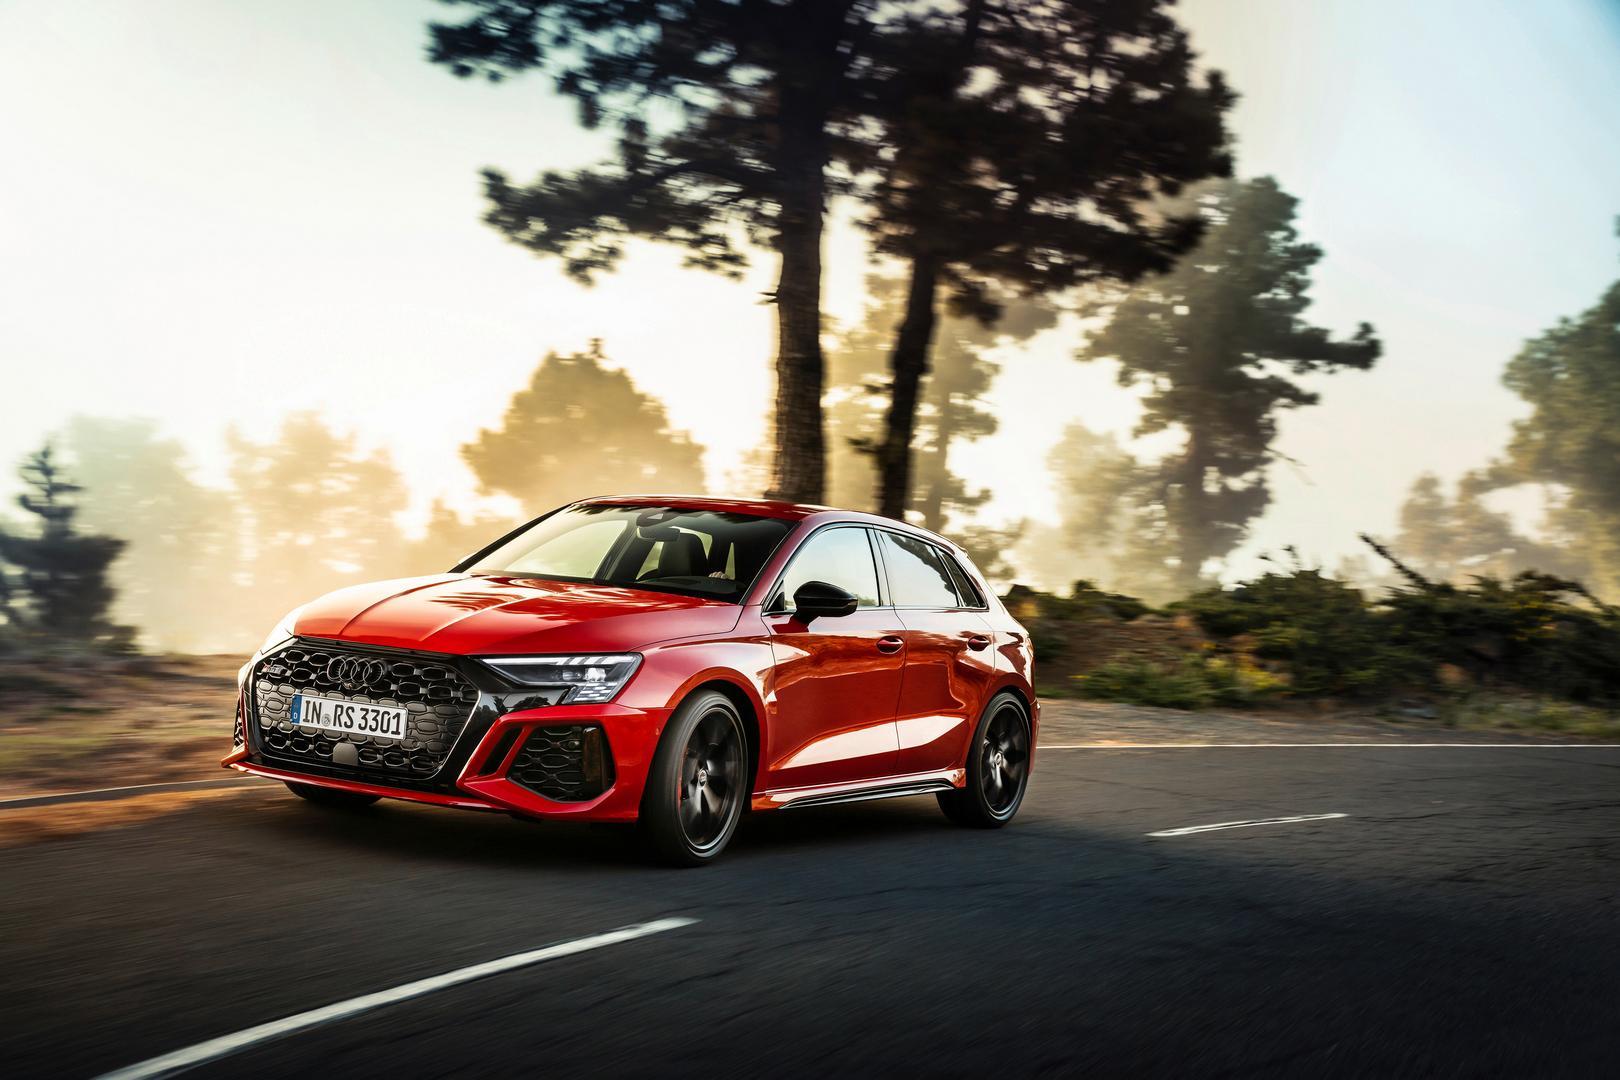 2022 Audi RS3 Sportback front